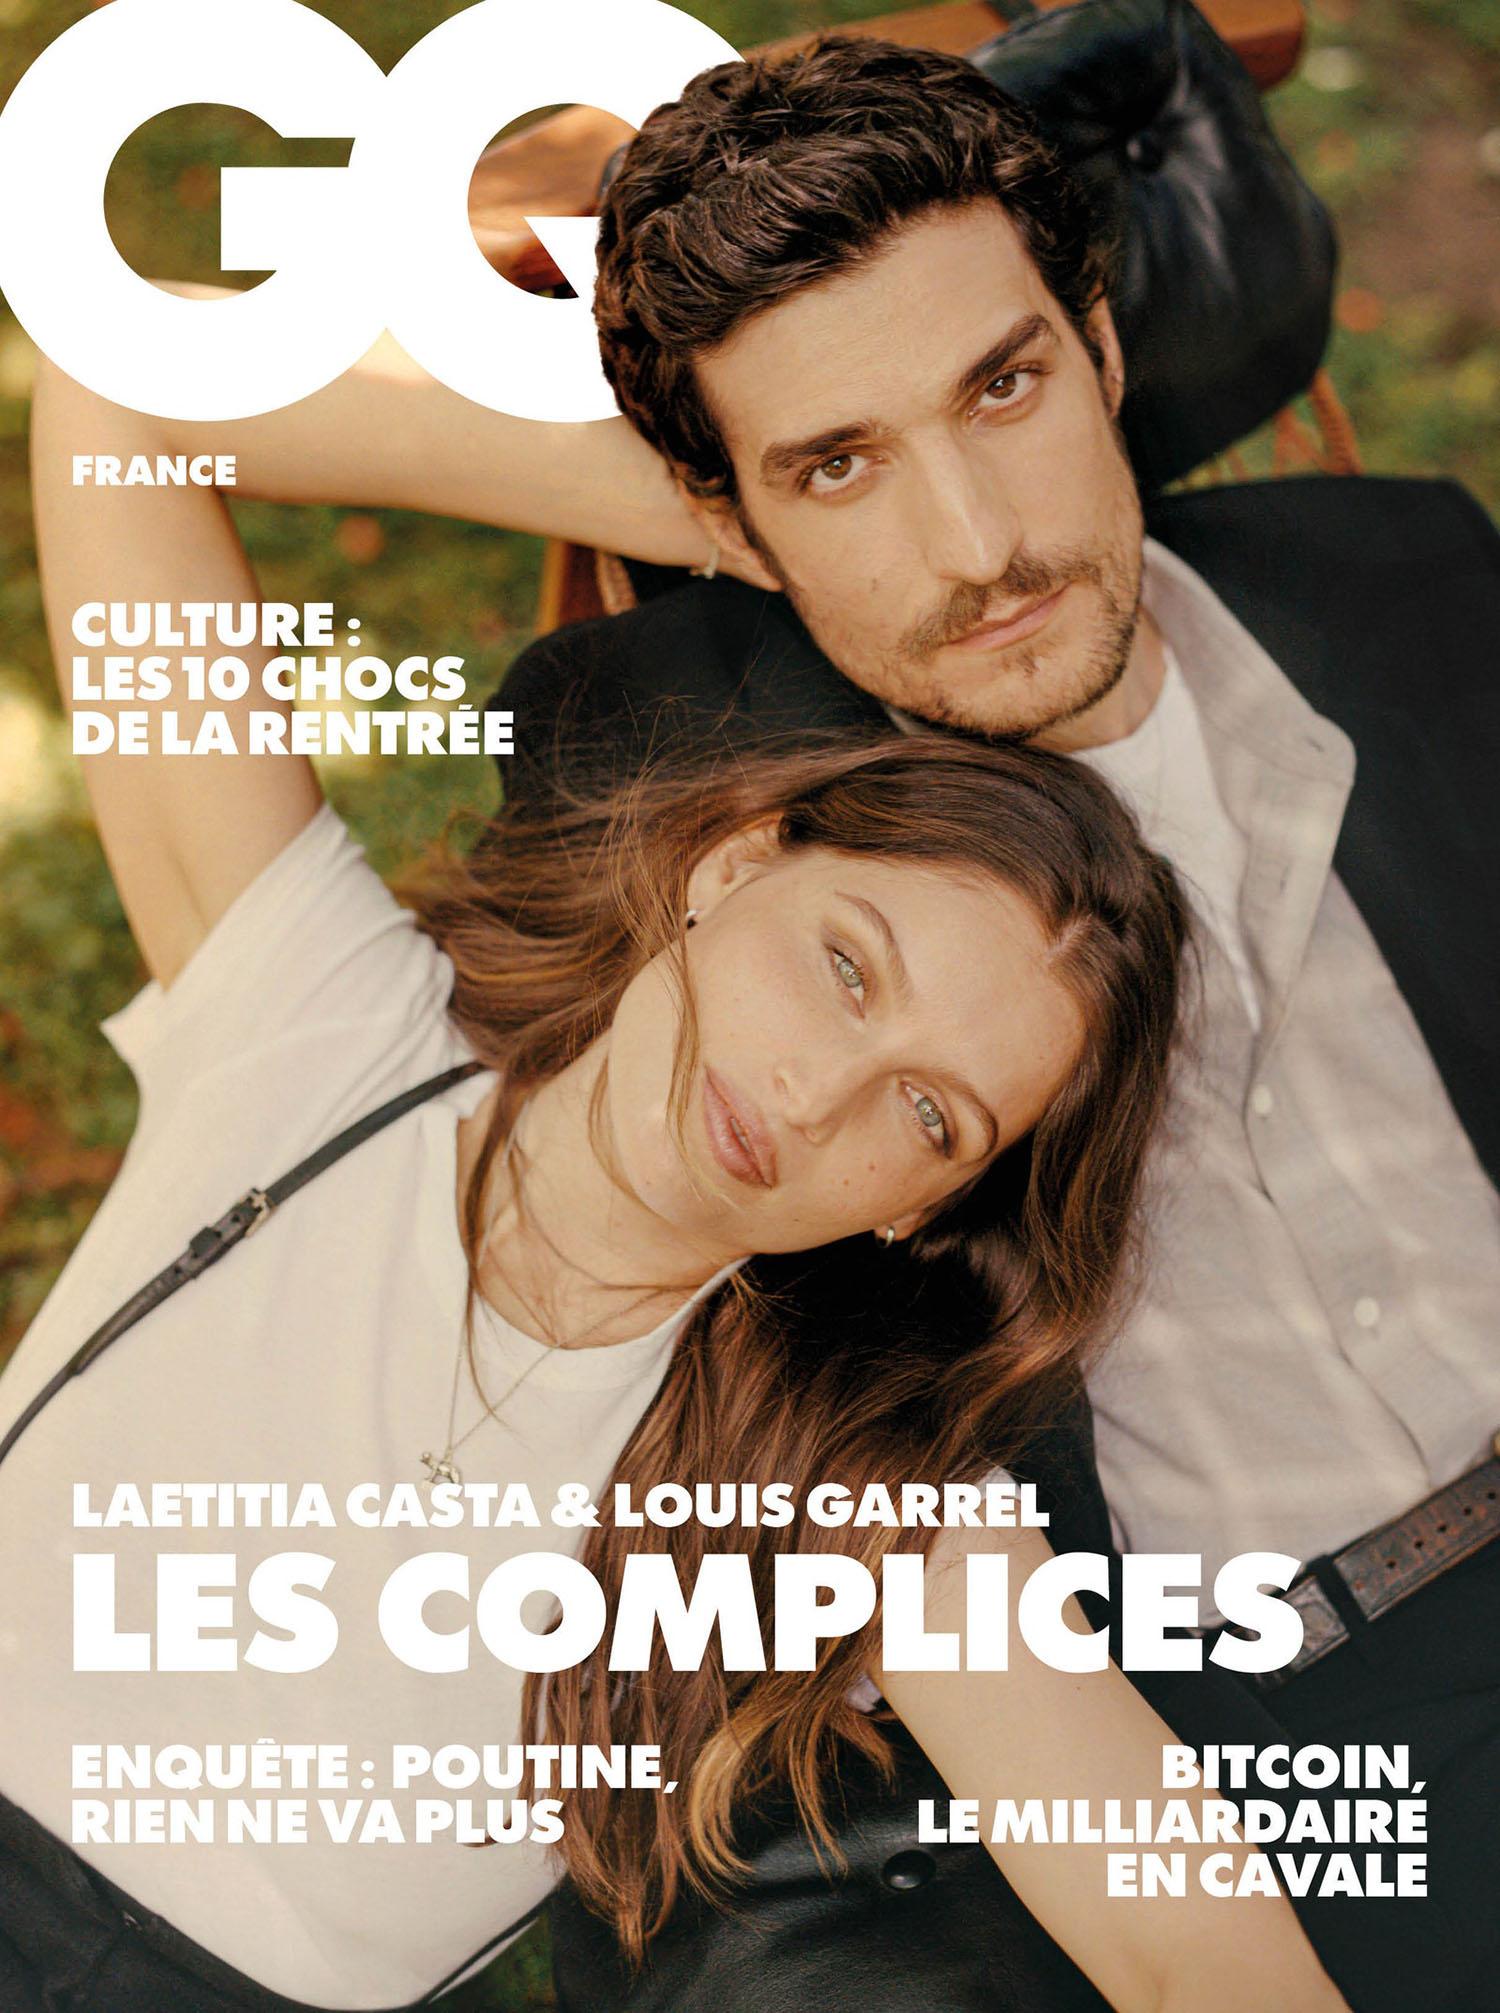 Laetitia Casta and Louis Garrel cover GQ France August 2021 by Quentin de Briey